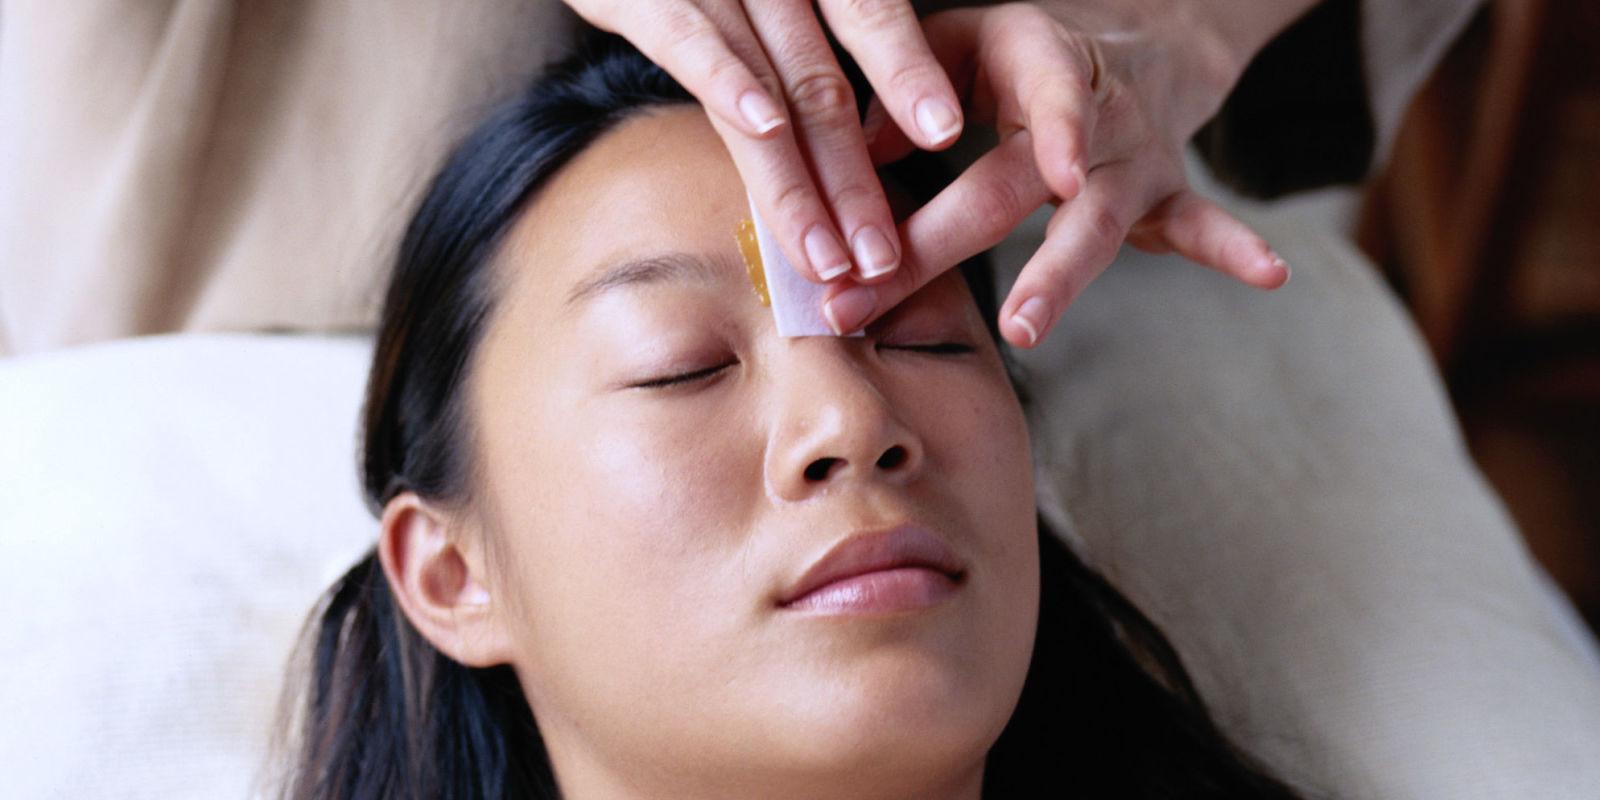 Facial Hair Waxing 101